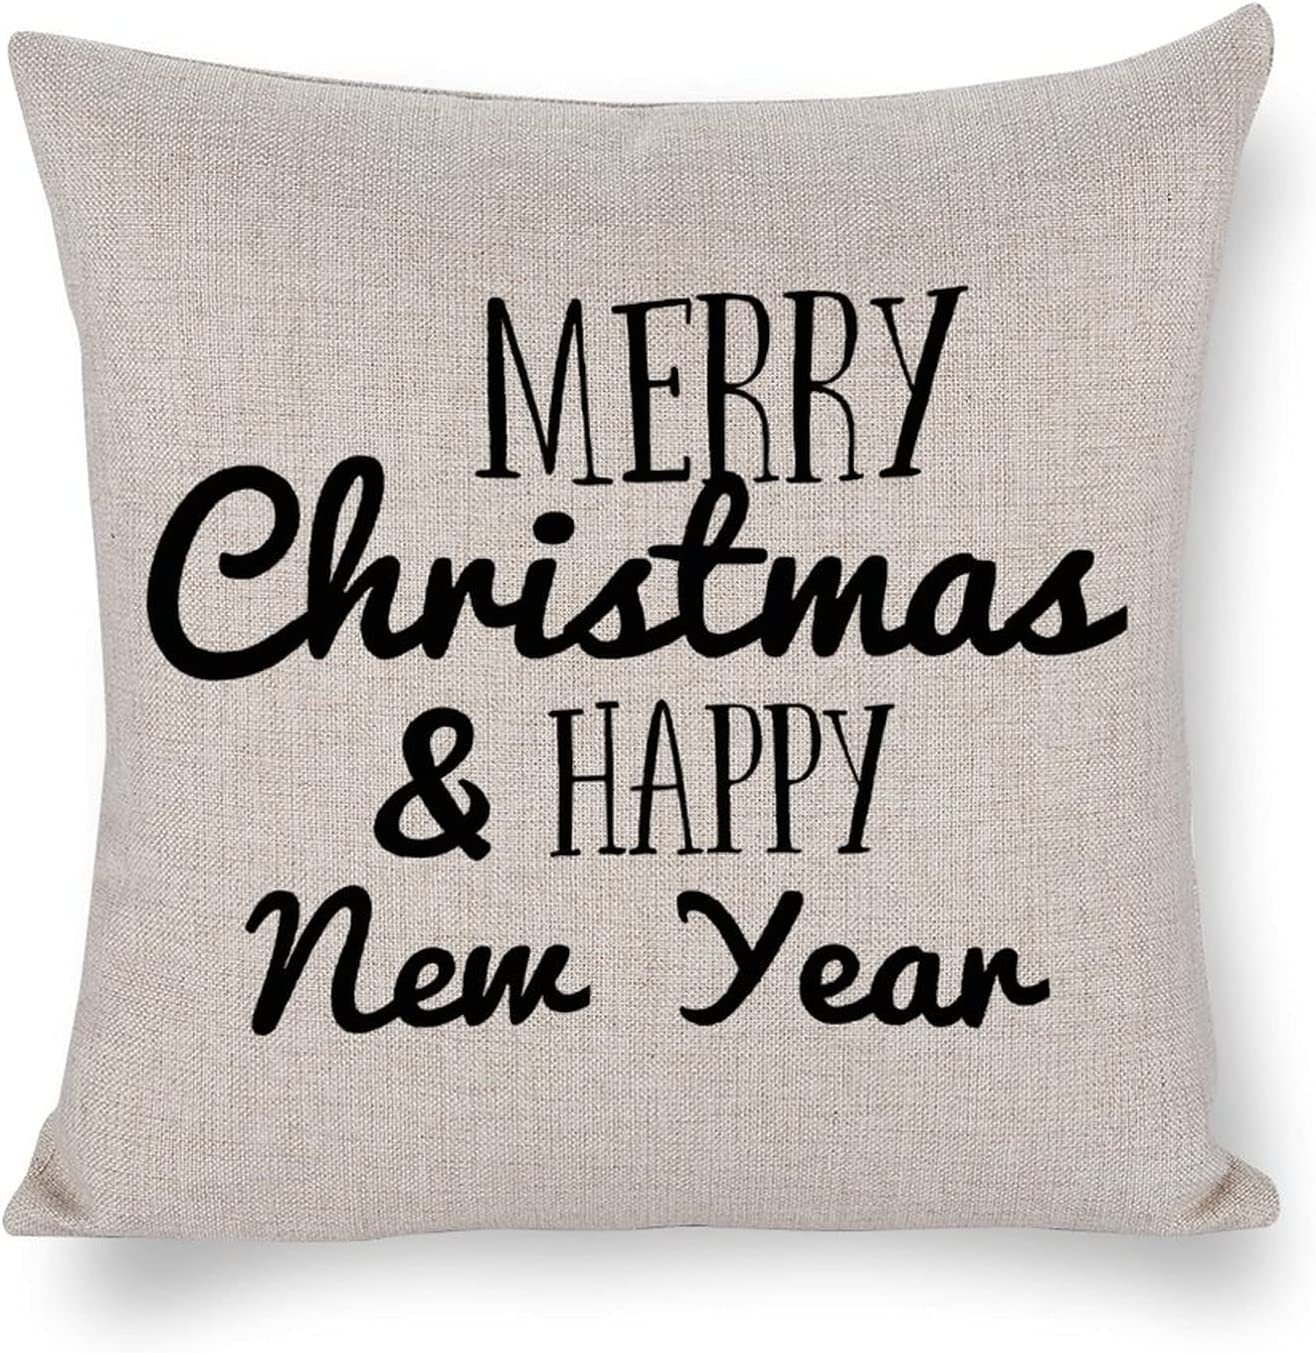 UTF4C Merry Christmas Happy New Year H Cushion Over item handling ☆ Raleigh Mall Linen Cotton Sofa